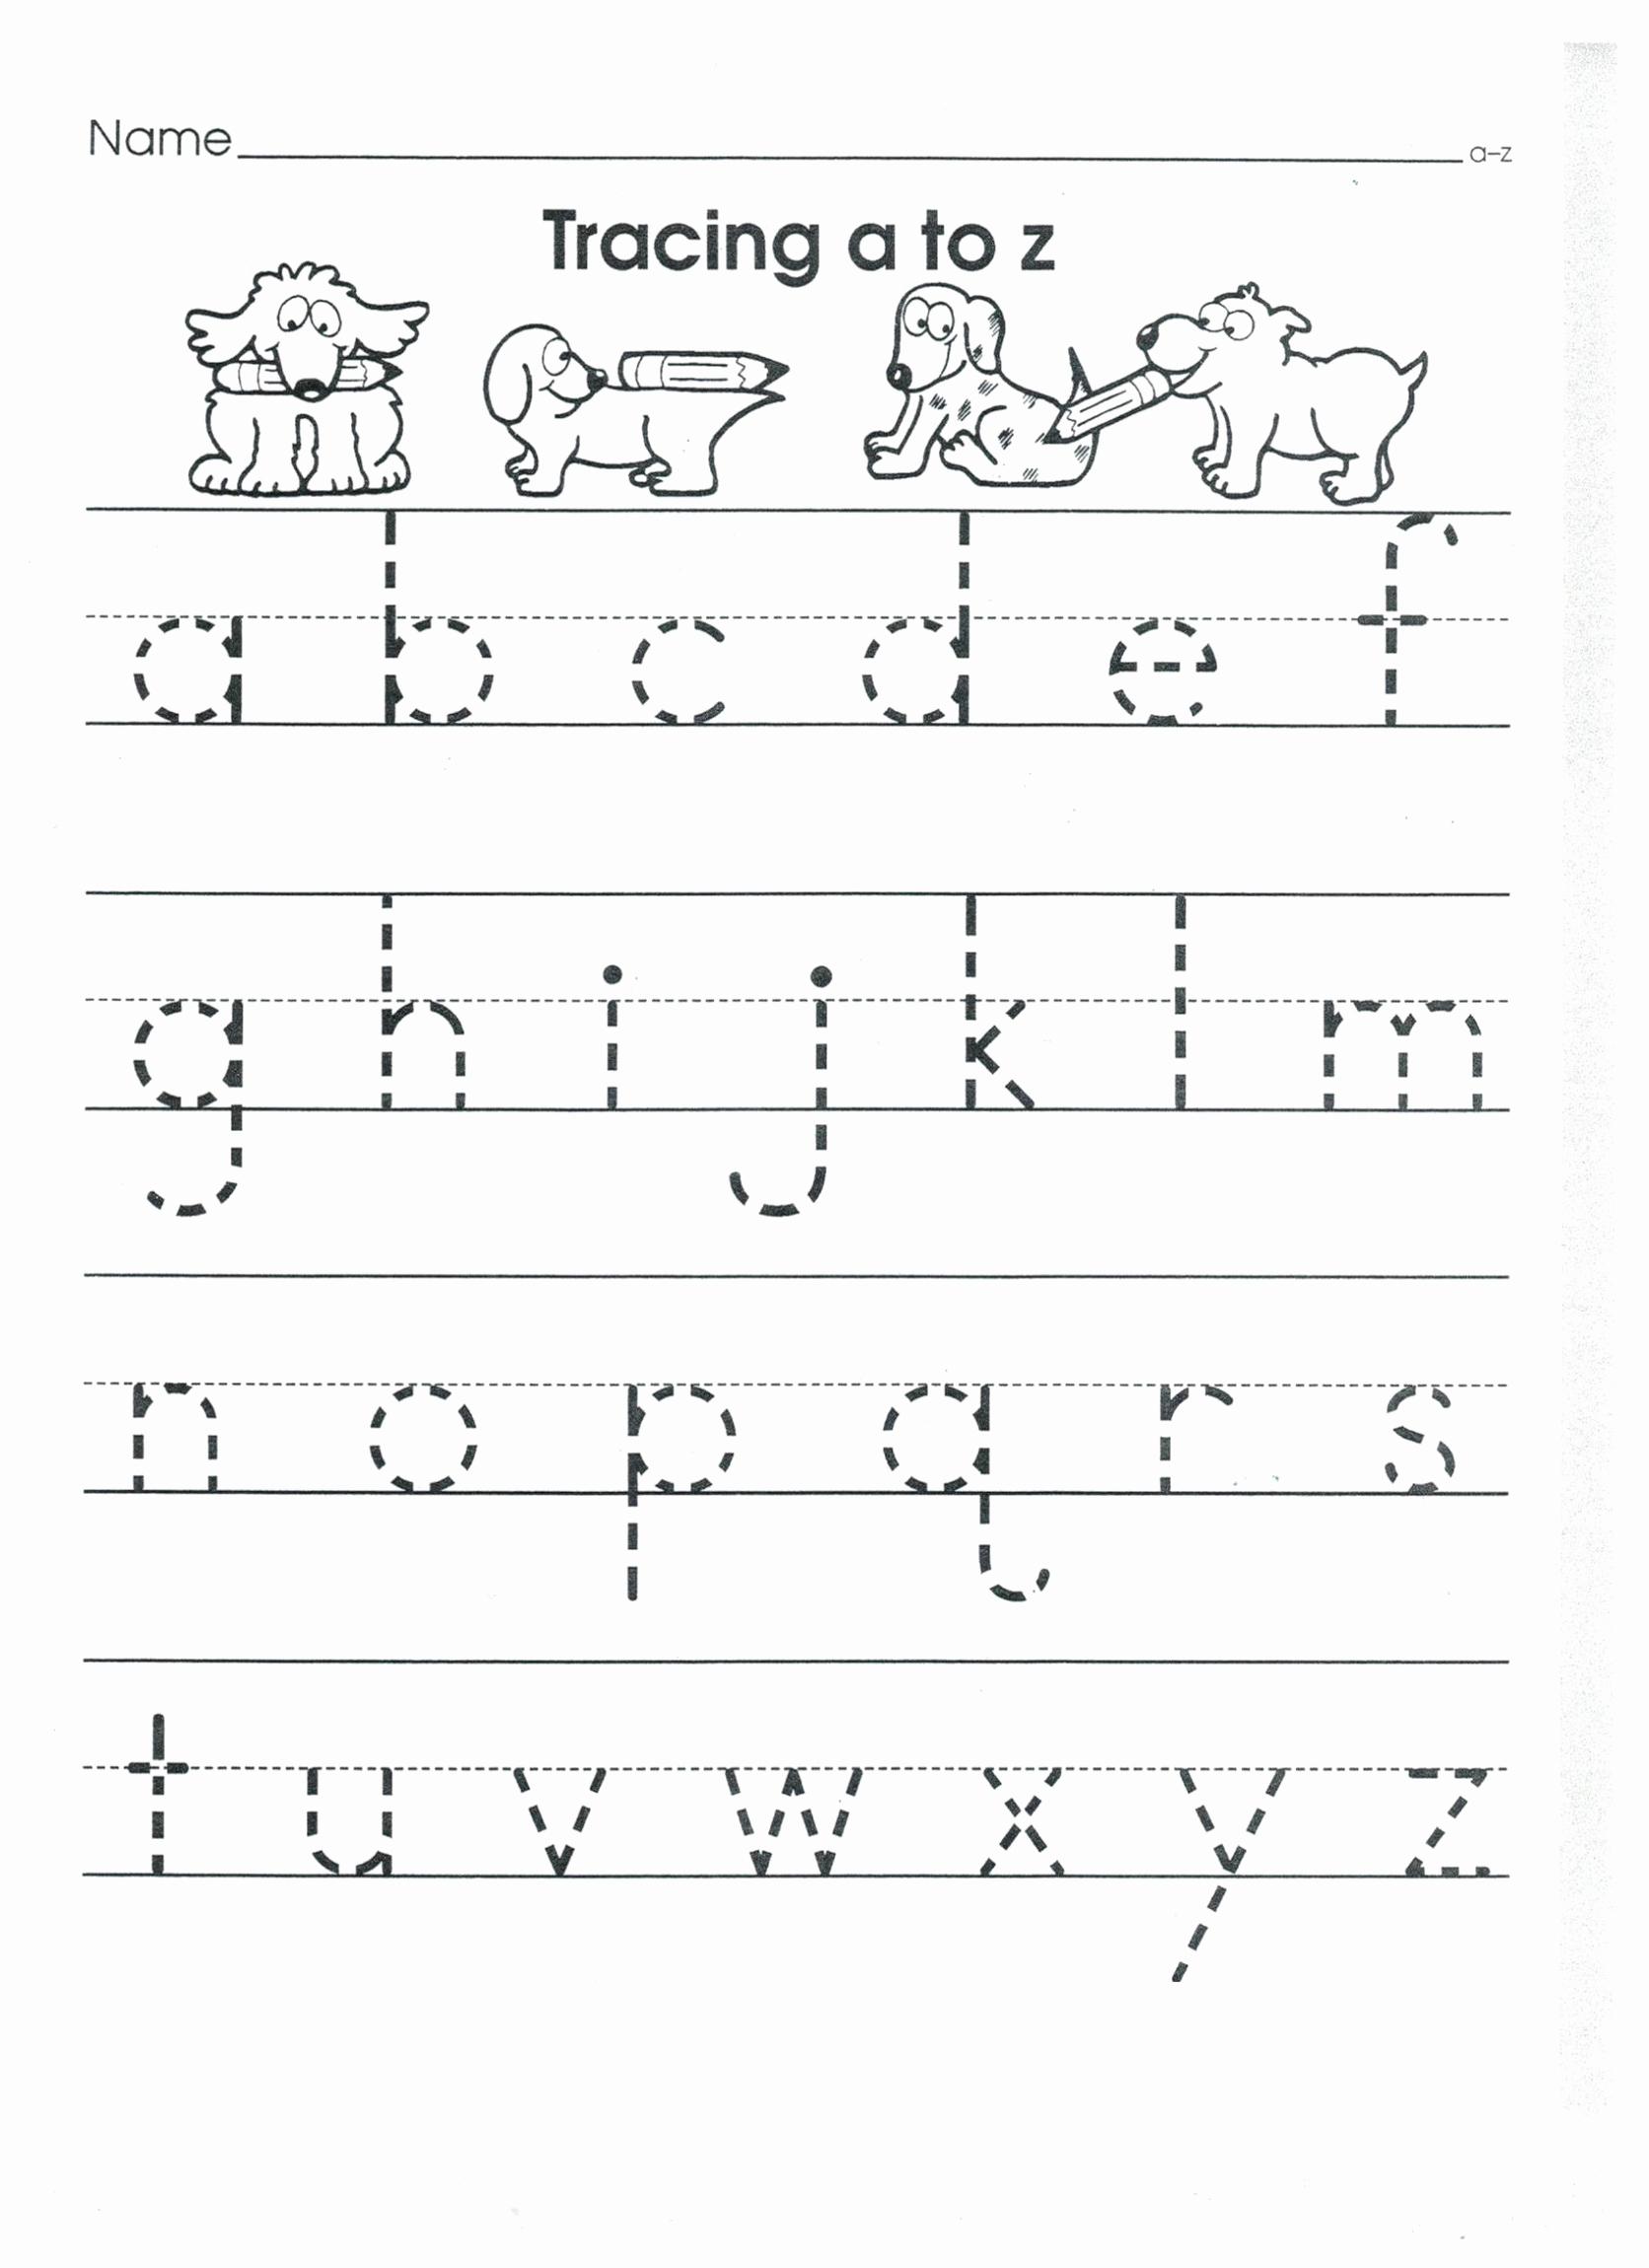 Kindergarten Lowercase Letters Worksheets Fresh Practice Writing Lowercase Letter Worksheets